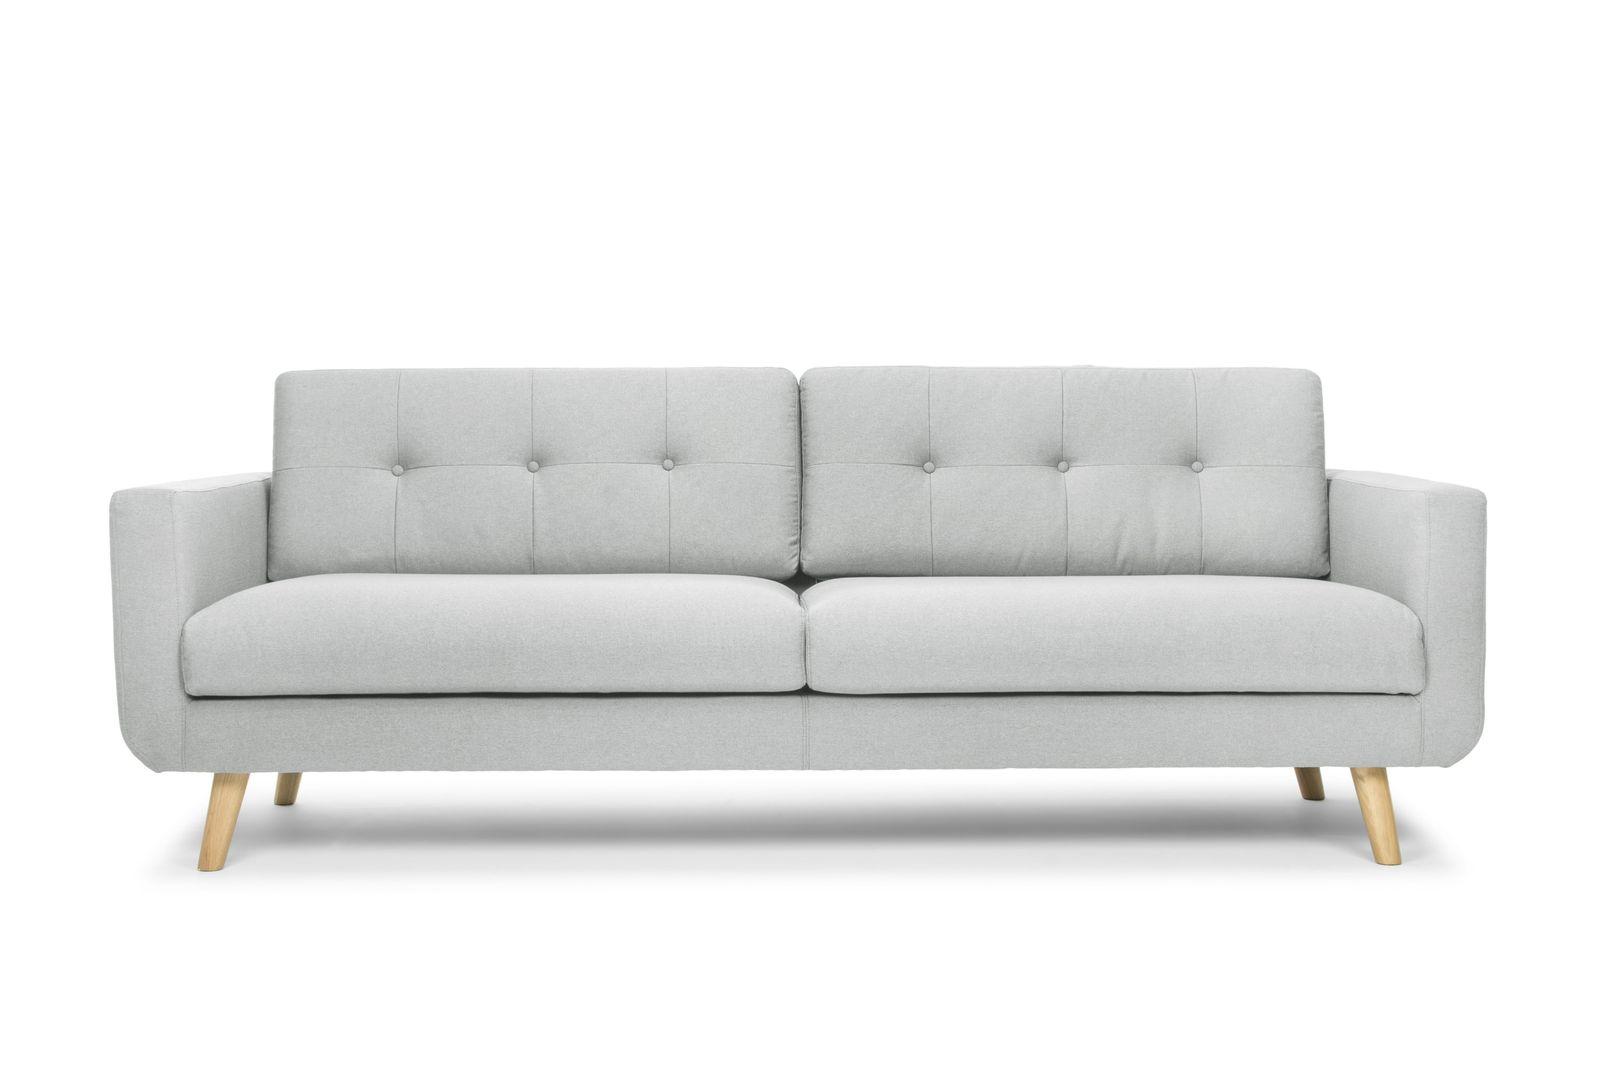 Maya Modern Contemporary 3 Seater Sofa Light Grey And Oak Legs Couch Design Sofa Design Sofa